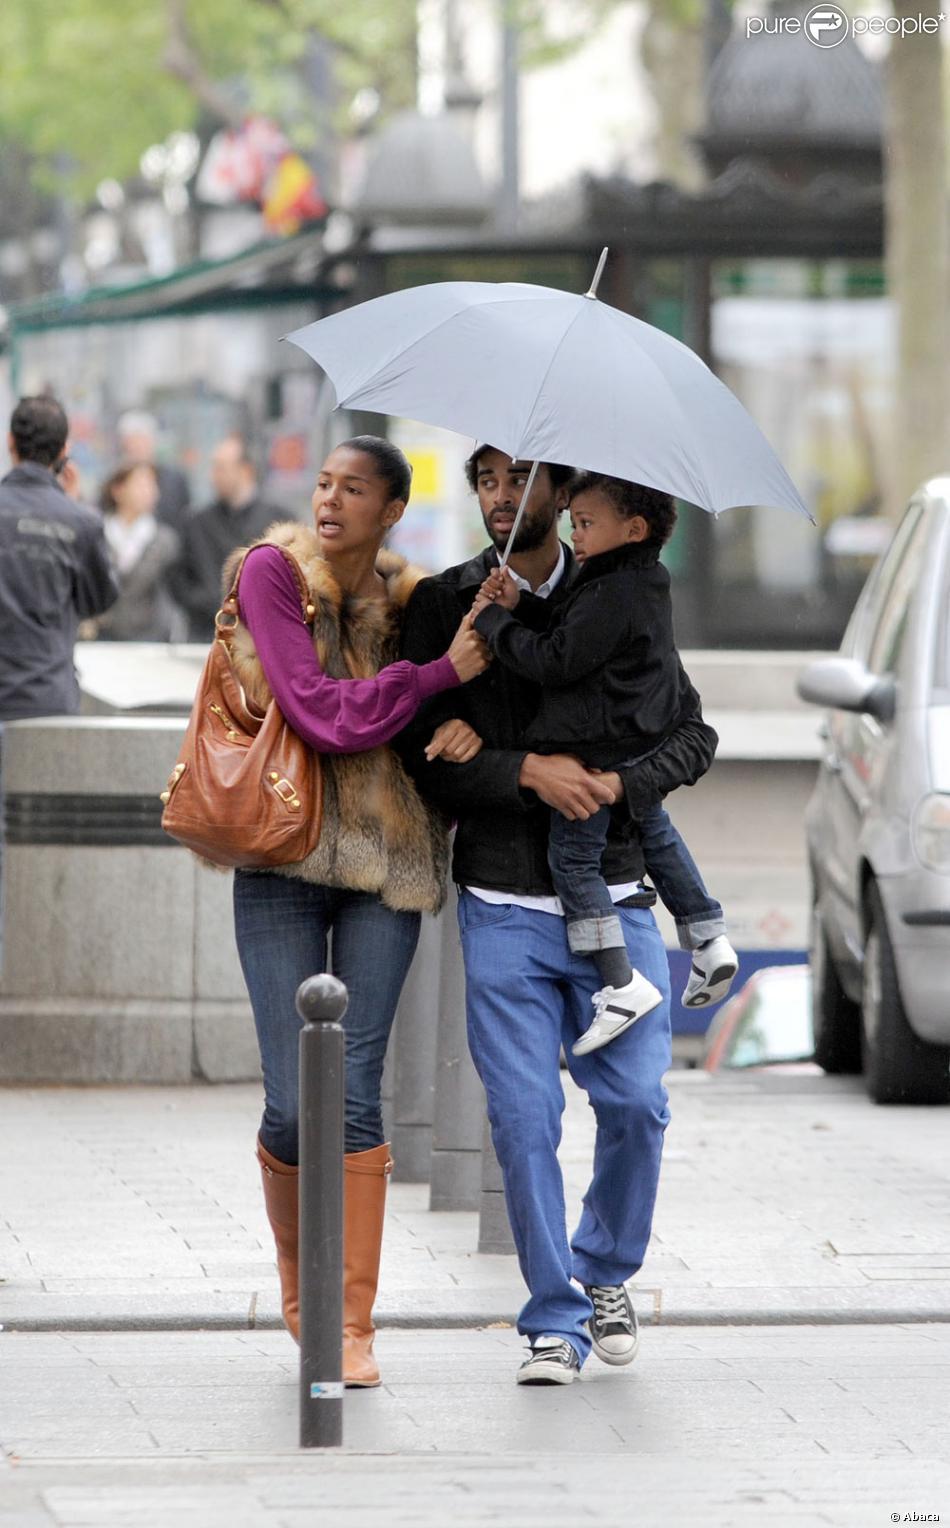 Ayo, son compagnon Patrice et son fils Nile - Purepeople